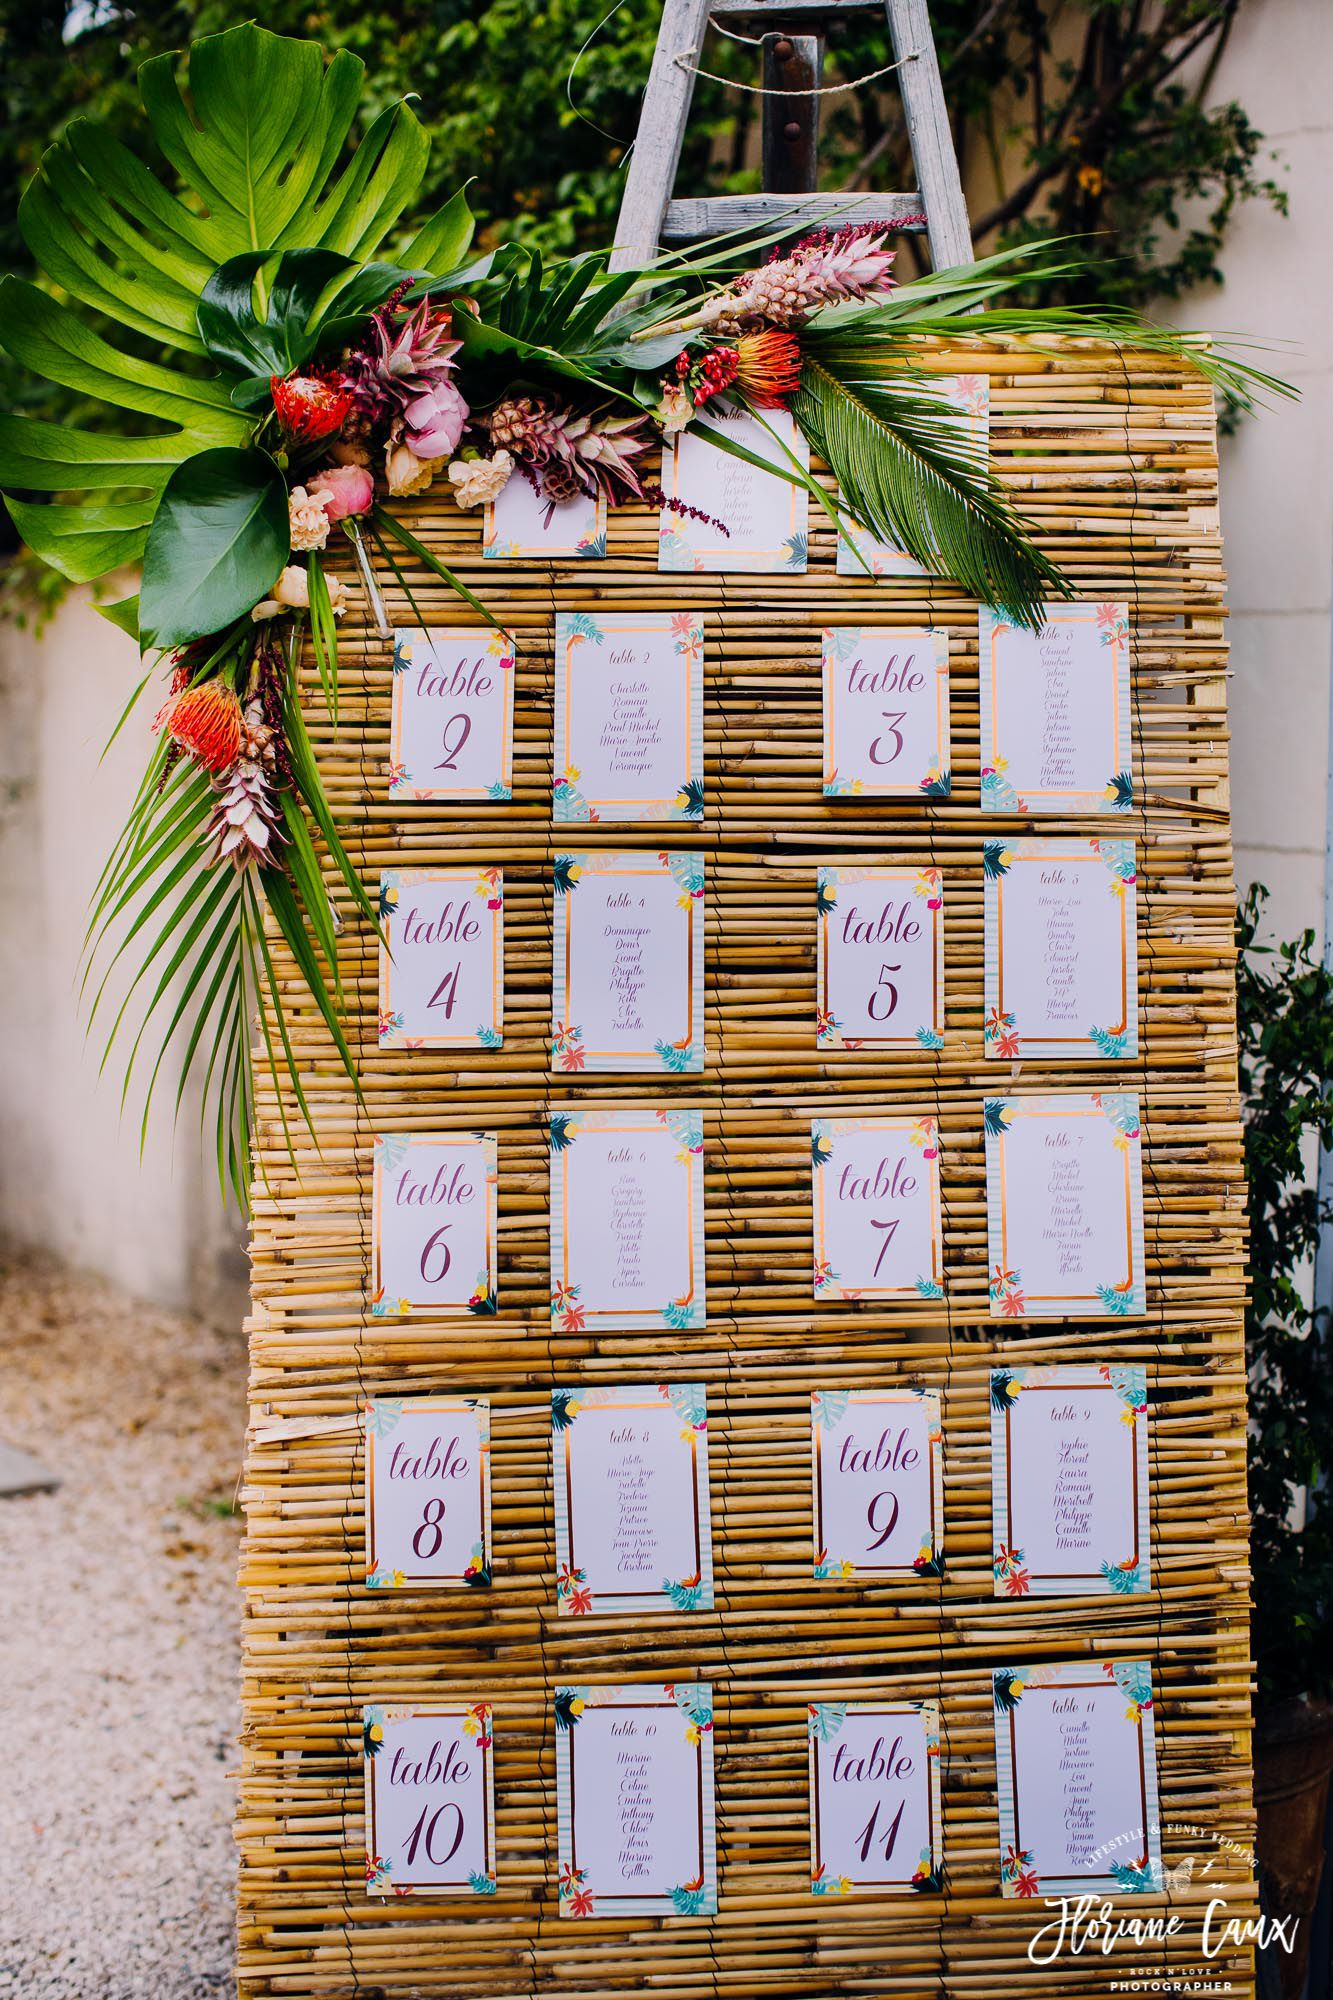 Mariage En Provence Wedding Venue In Provence France Mariage